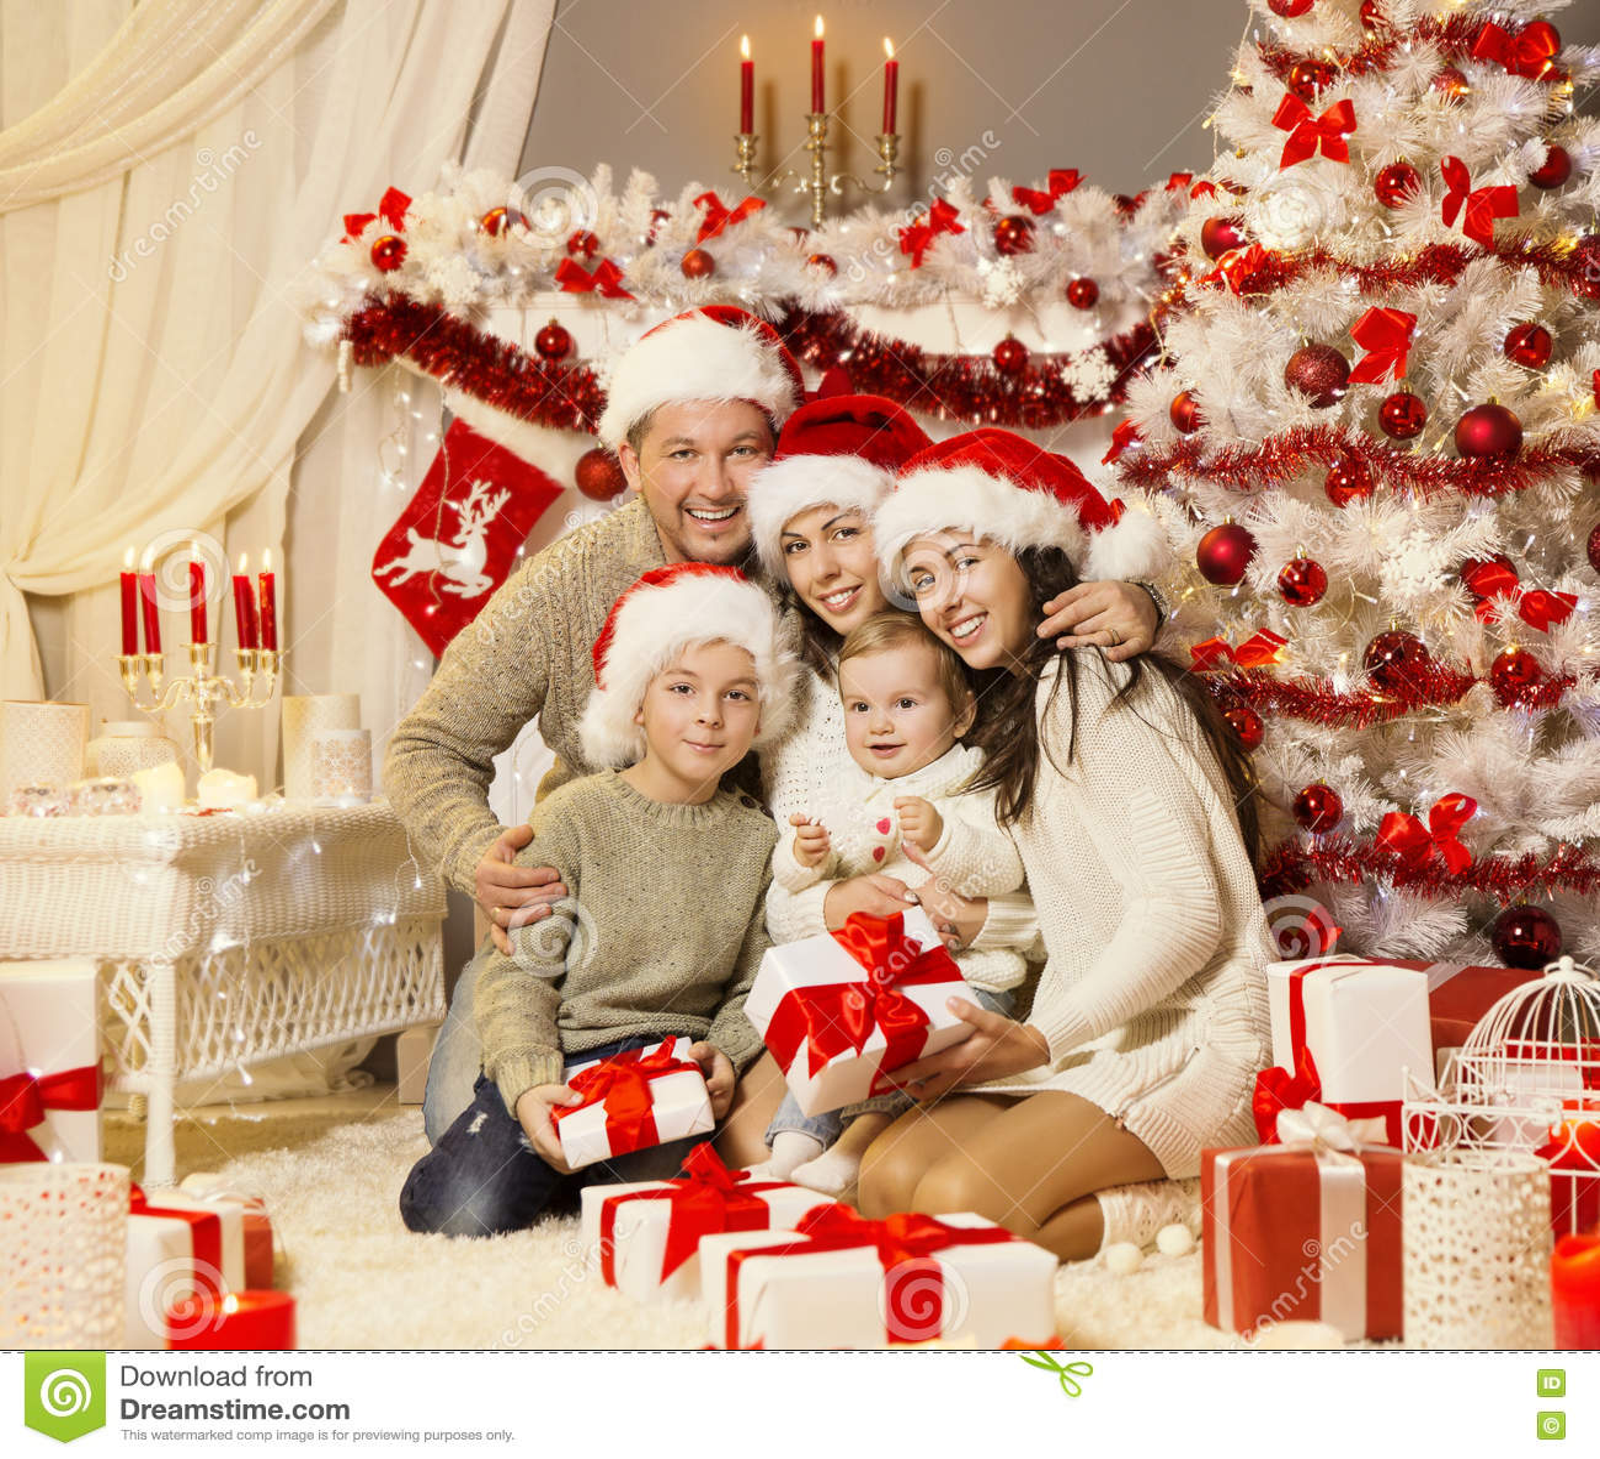 Brc Holiday Celebration Photos 2015: Christmas Family Portrait, Xmas Tree Presents Gifts